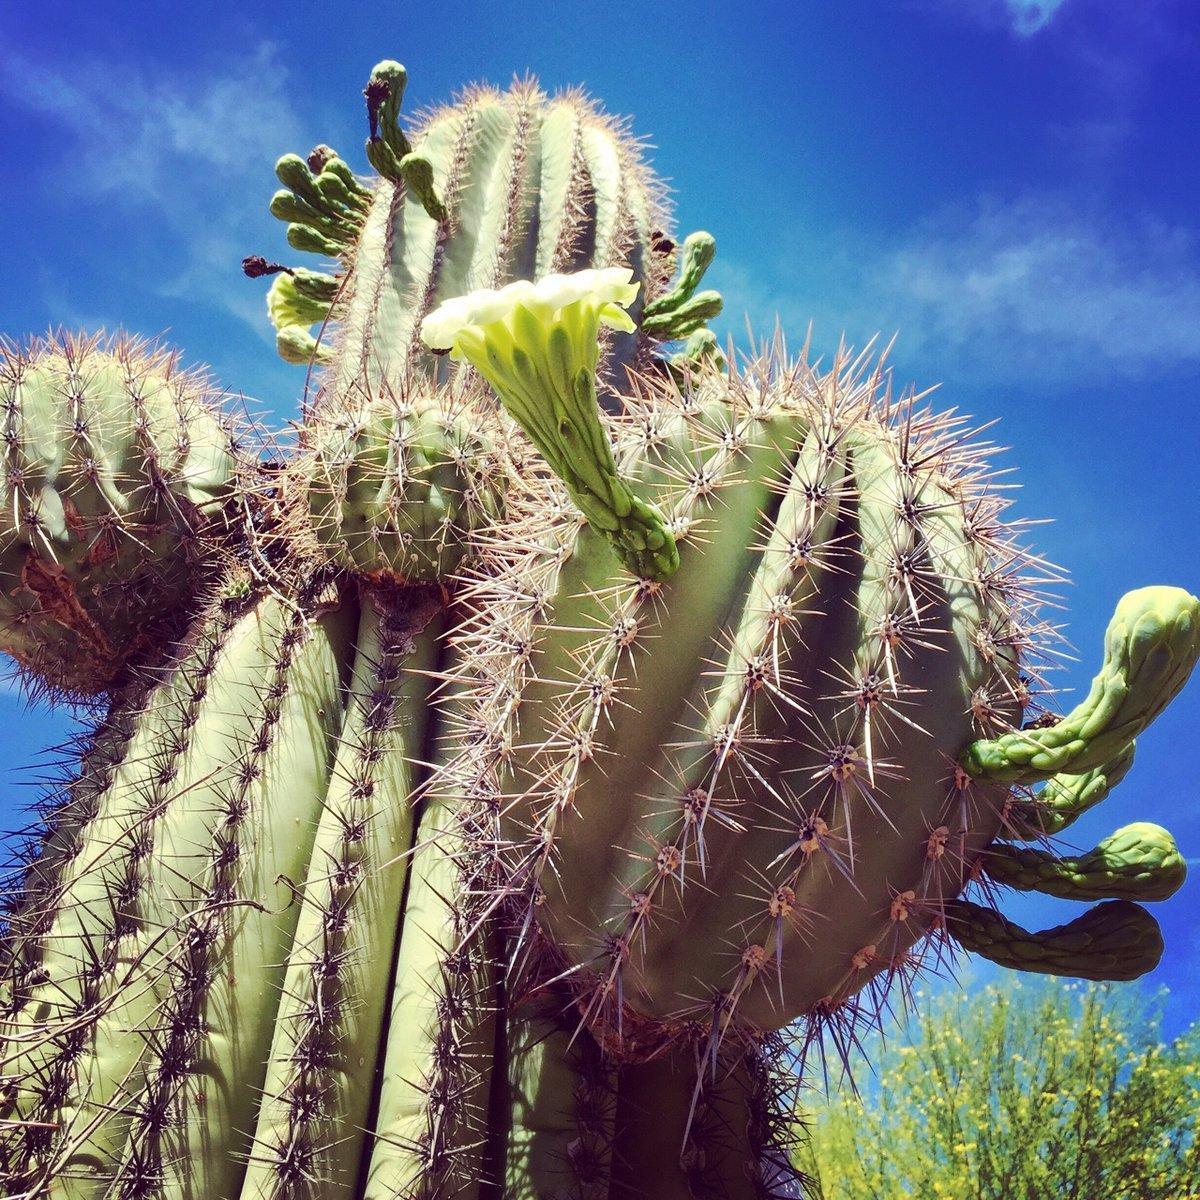 Картинка с кактусами